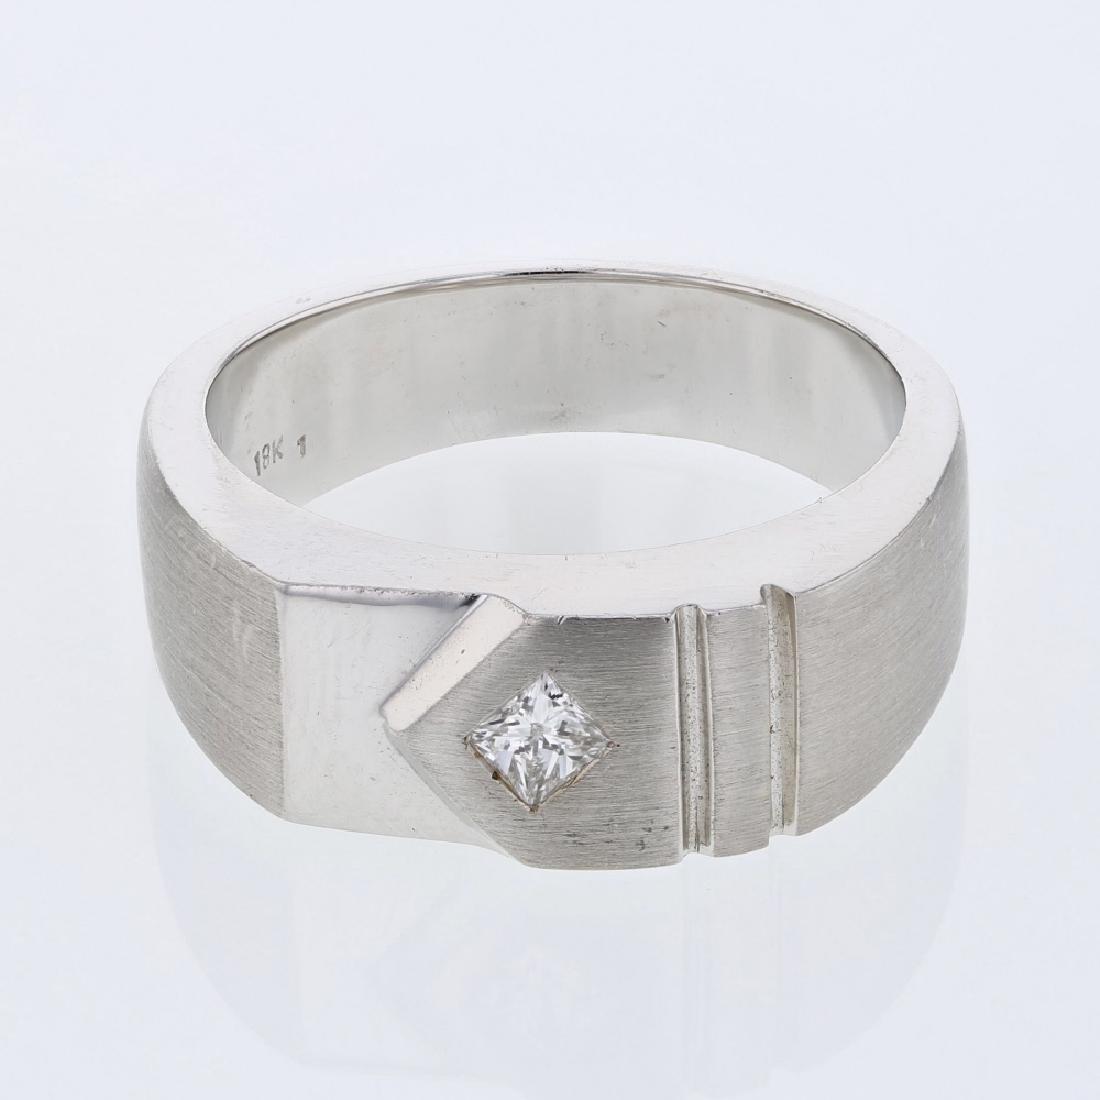 Flush-set Princess-cut Diamond Gents Ring in 18K White